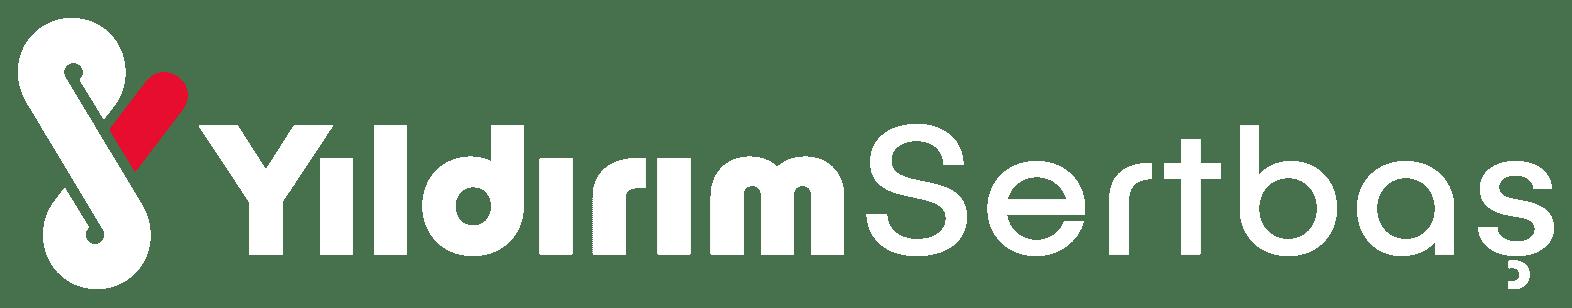 yildirim-sertbas-logo-02